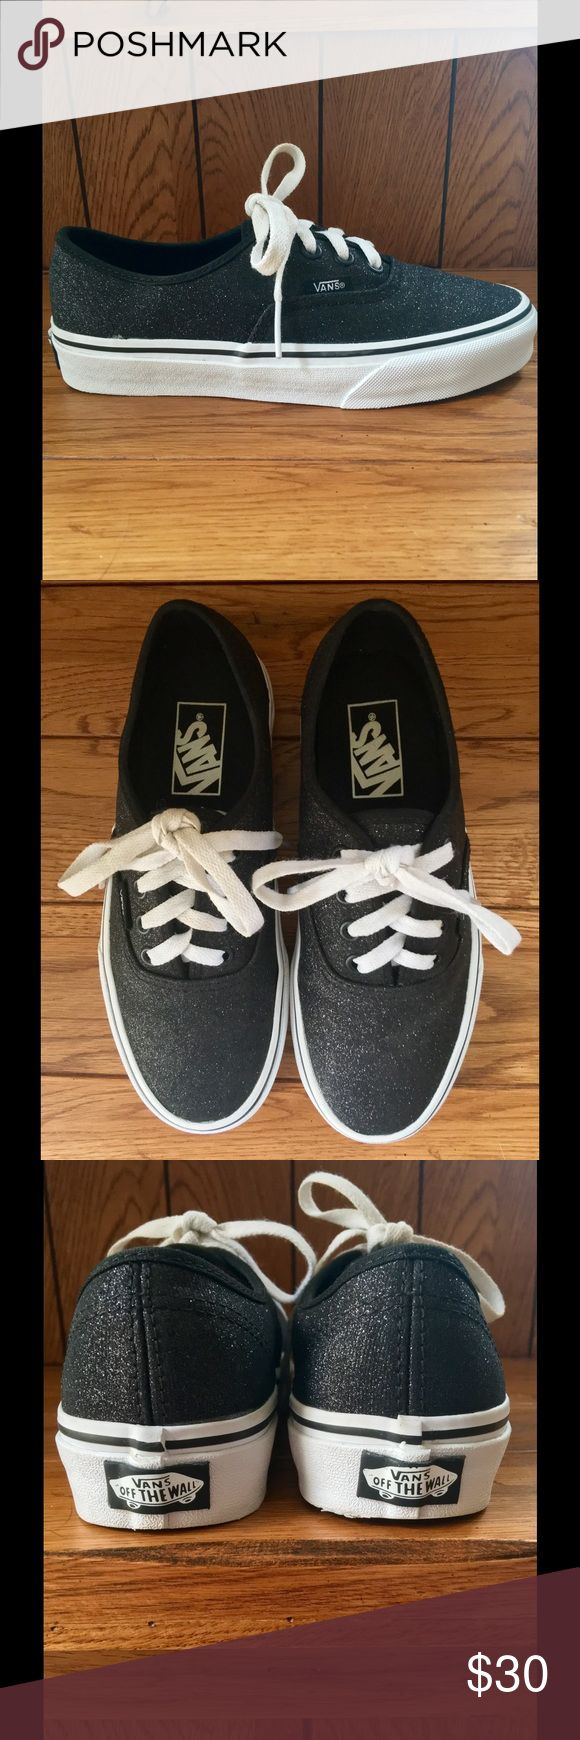 Roller shoes vans - Vans Shoes